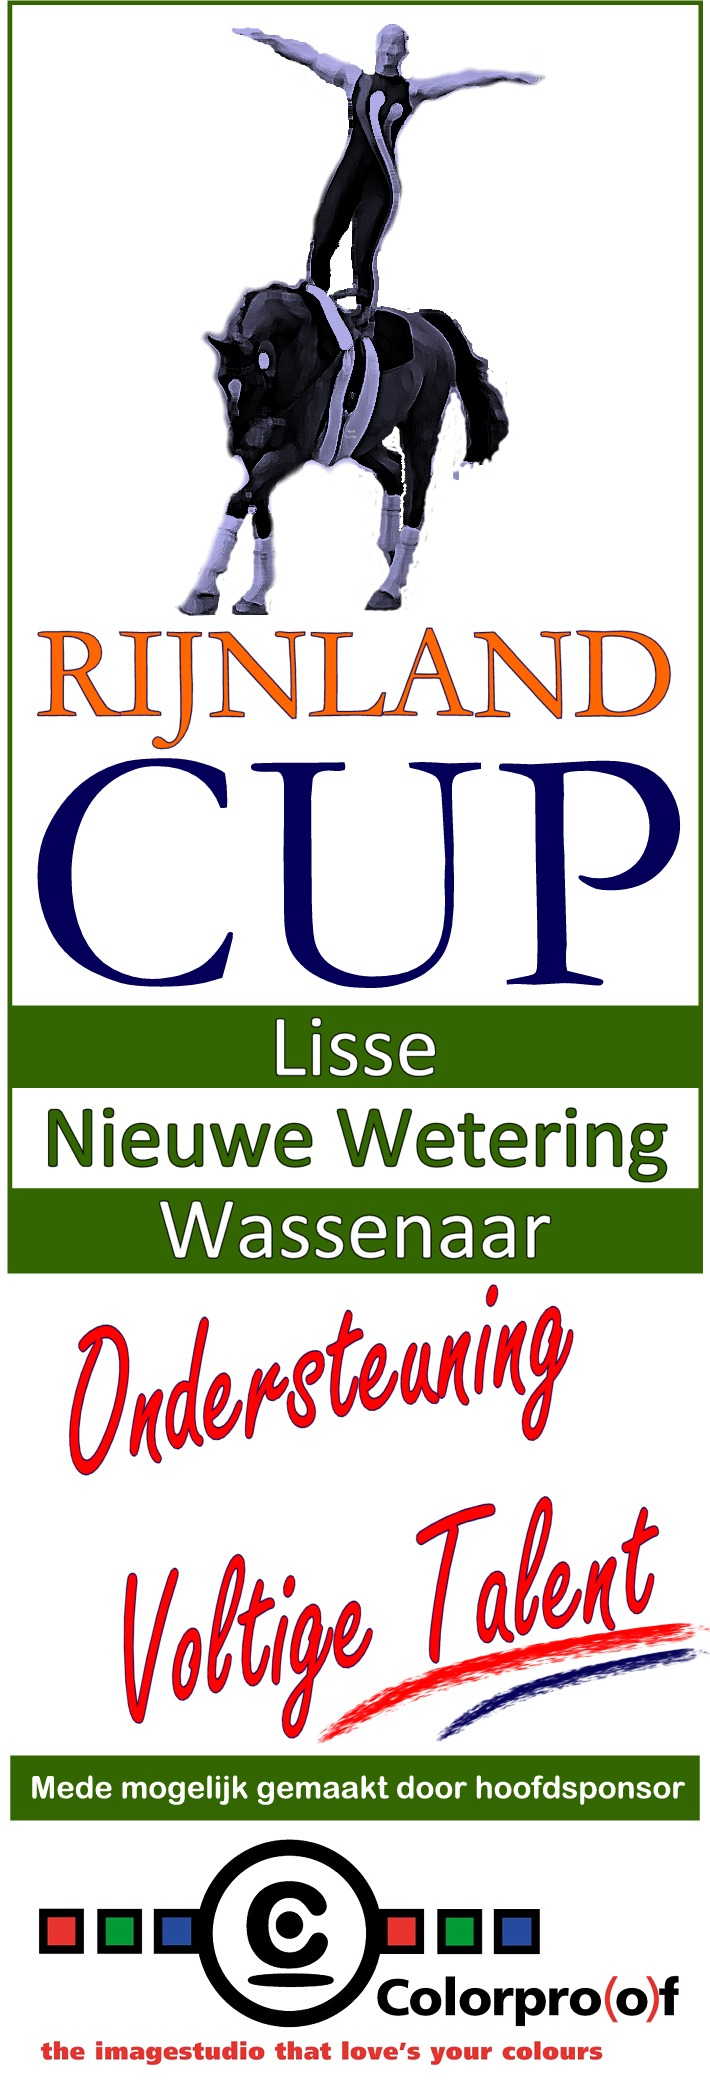 http://www.rijnlandcup.nl/RVC%20SPONSOR%20kleur%2012x29cm.jpg